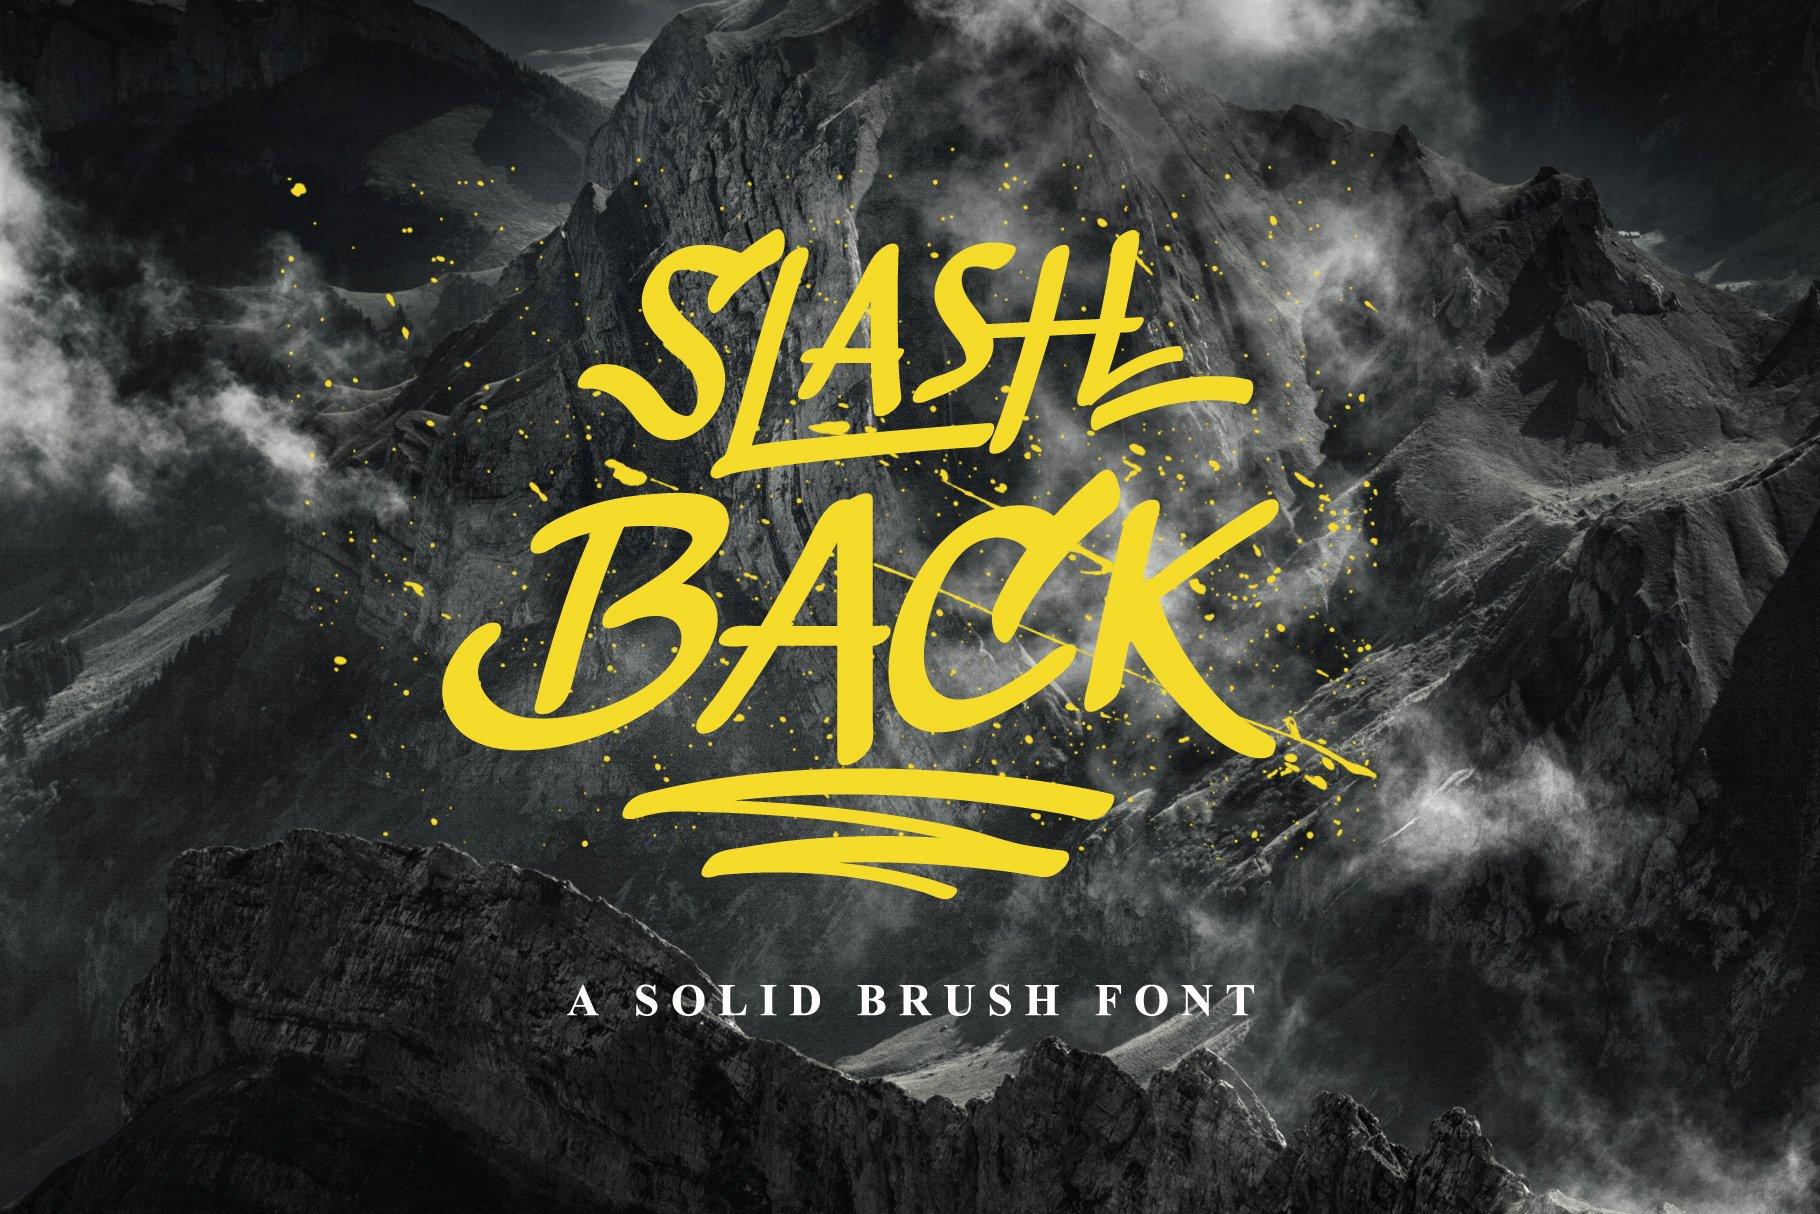 Slashback个性大片海报笔刷手写英文字体下载